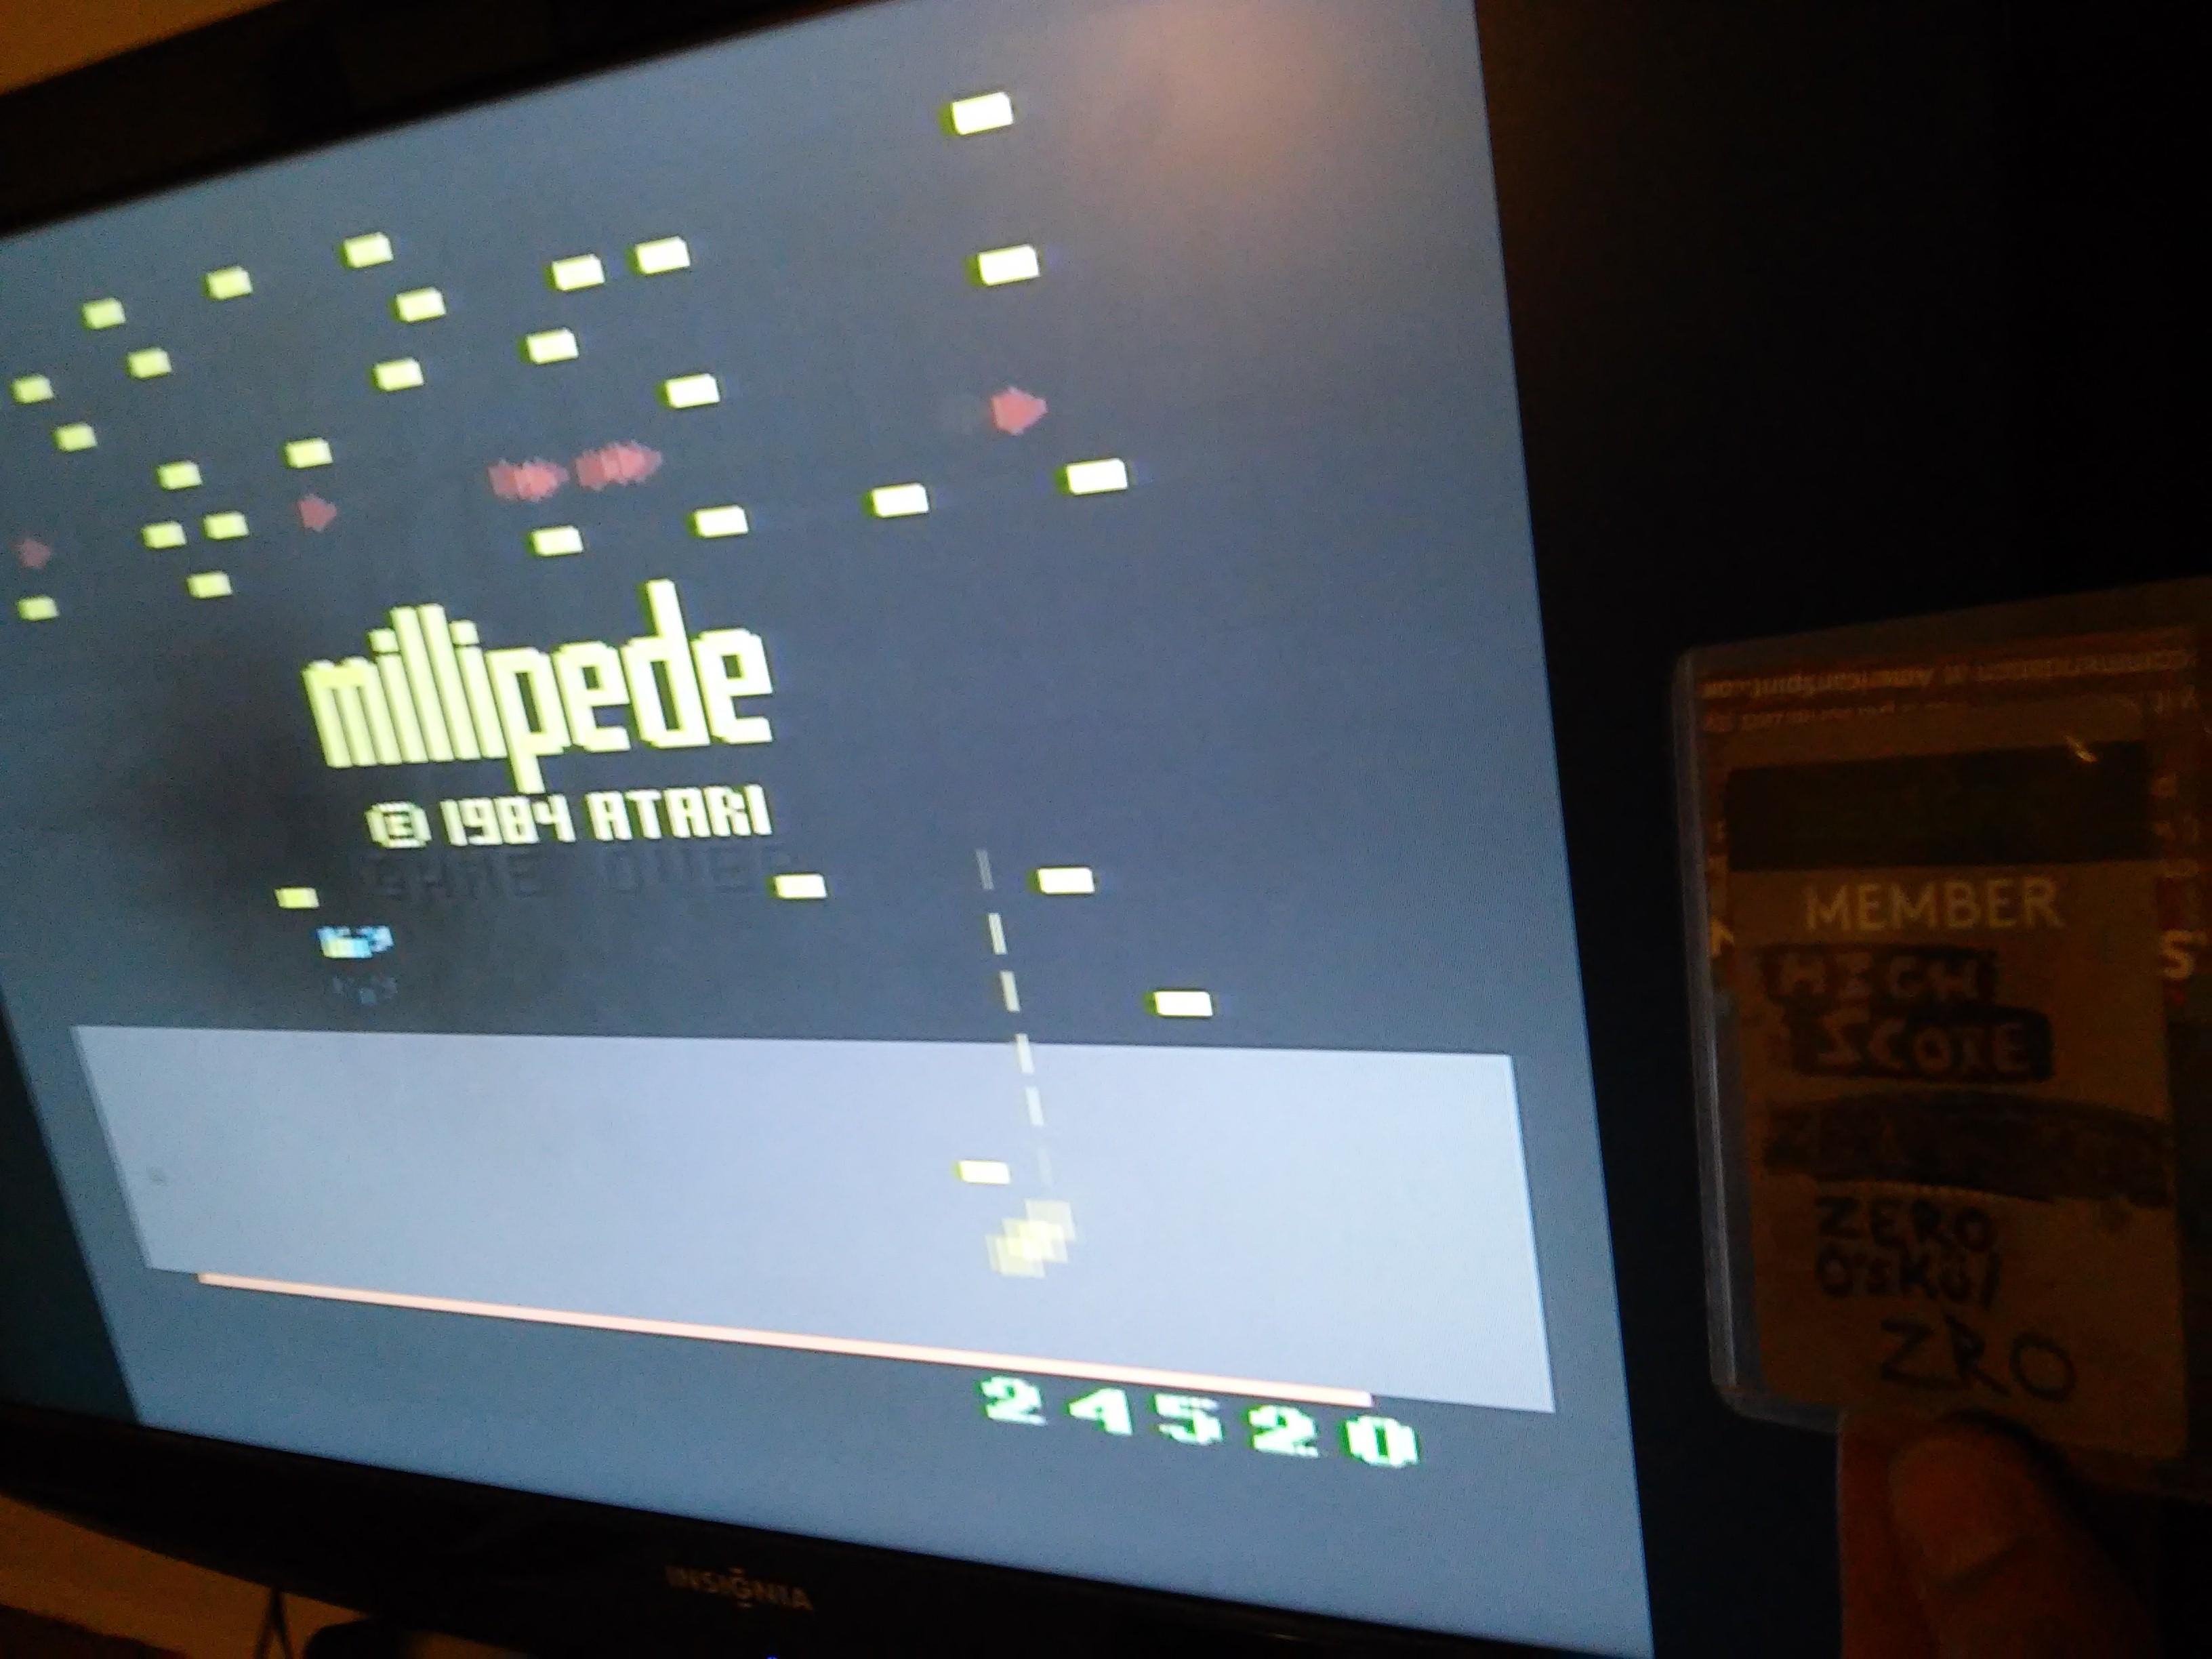 zerooskul: Millipede (Atari 2600 Emulated Expert/A Mode) 24,520 points on 2020-02-13 20:11:46